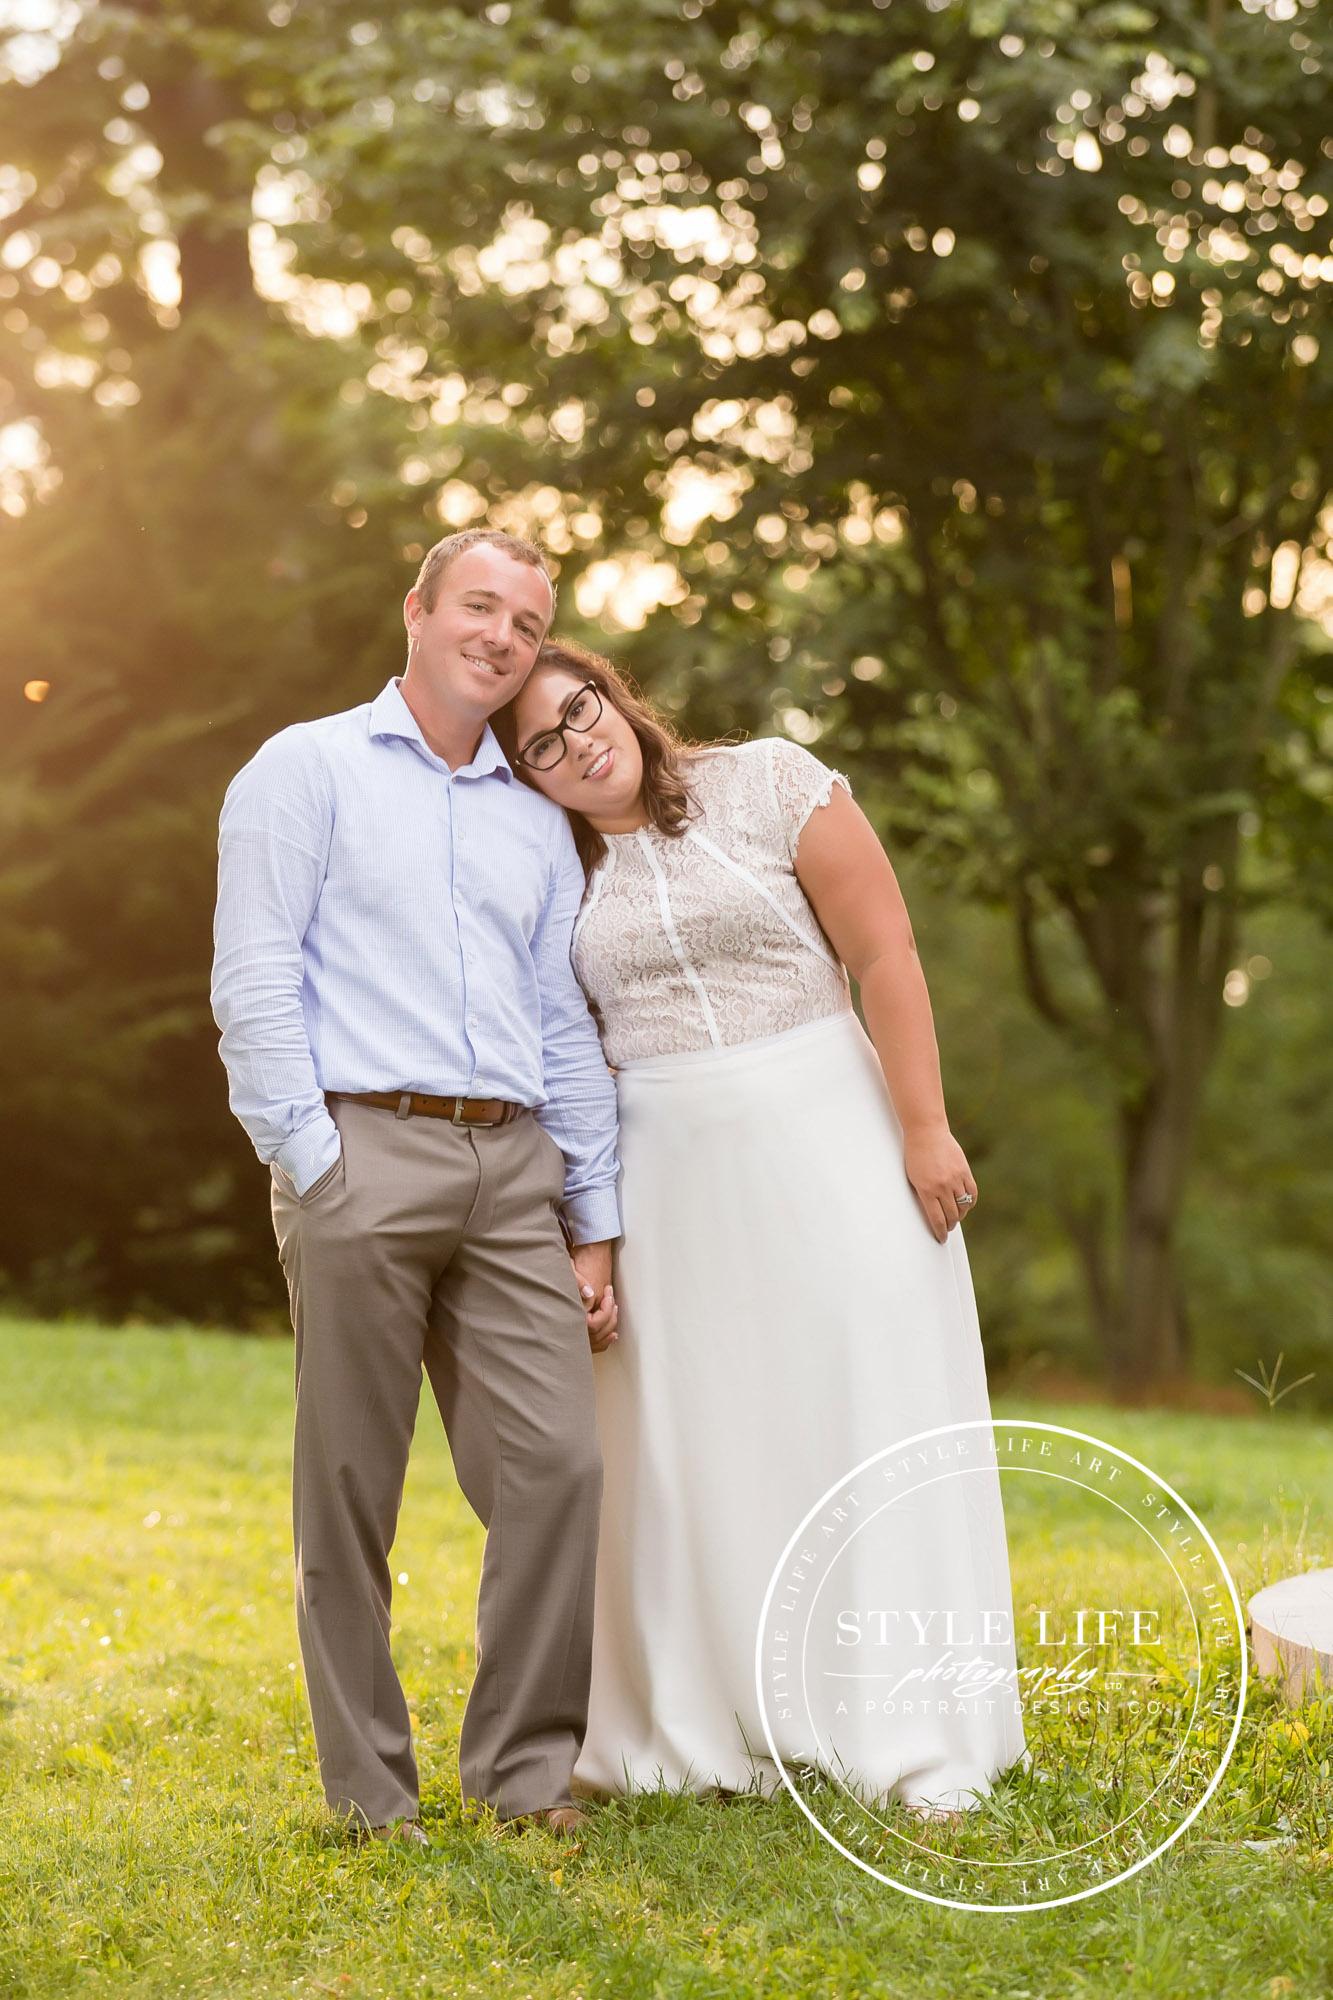 Nate_&_Lori_Family_'18-50-WEB